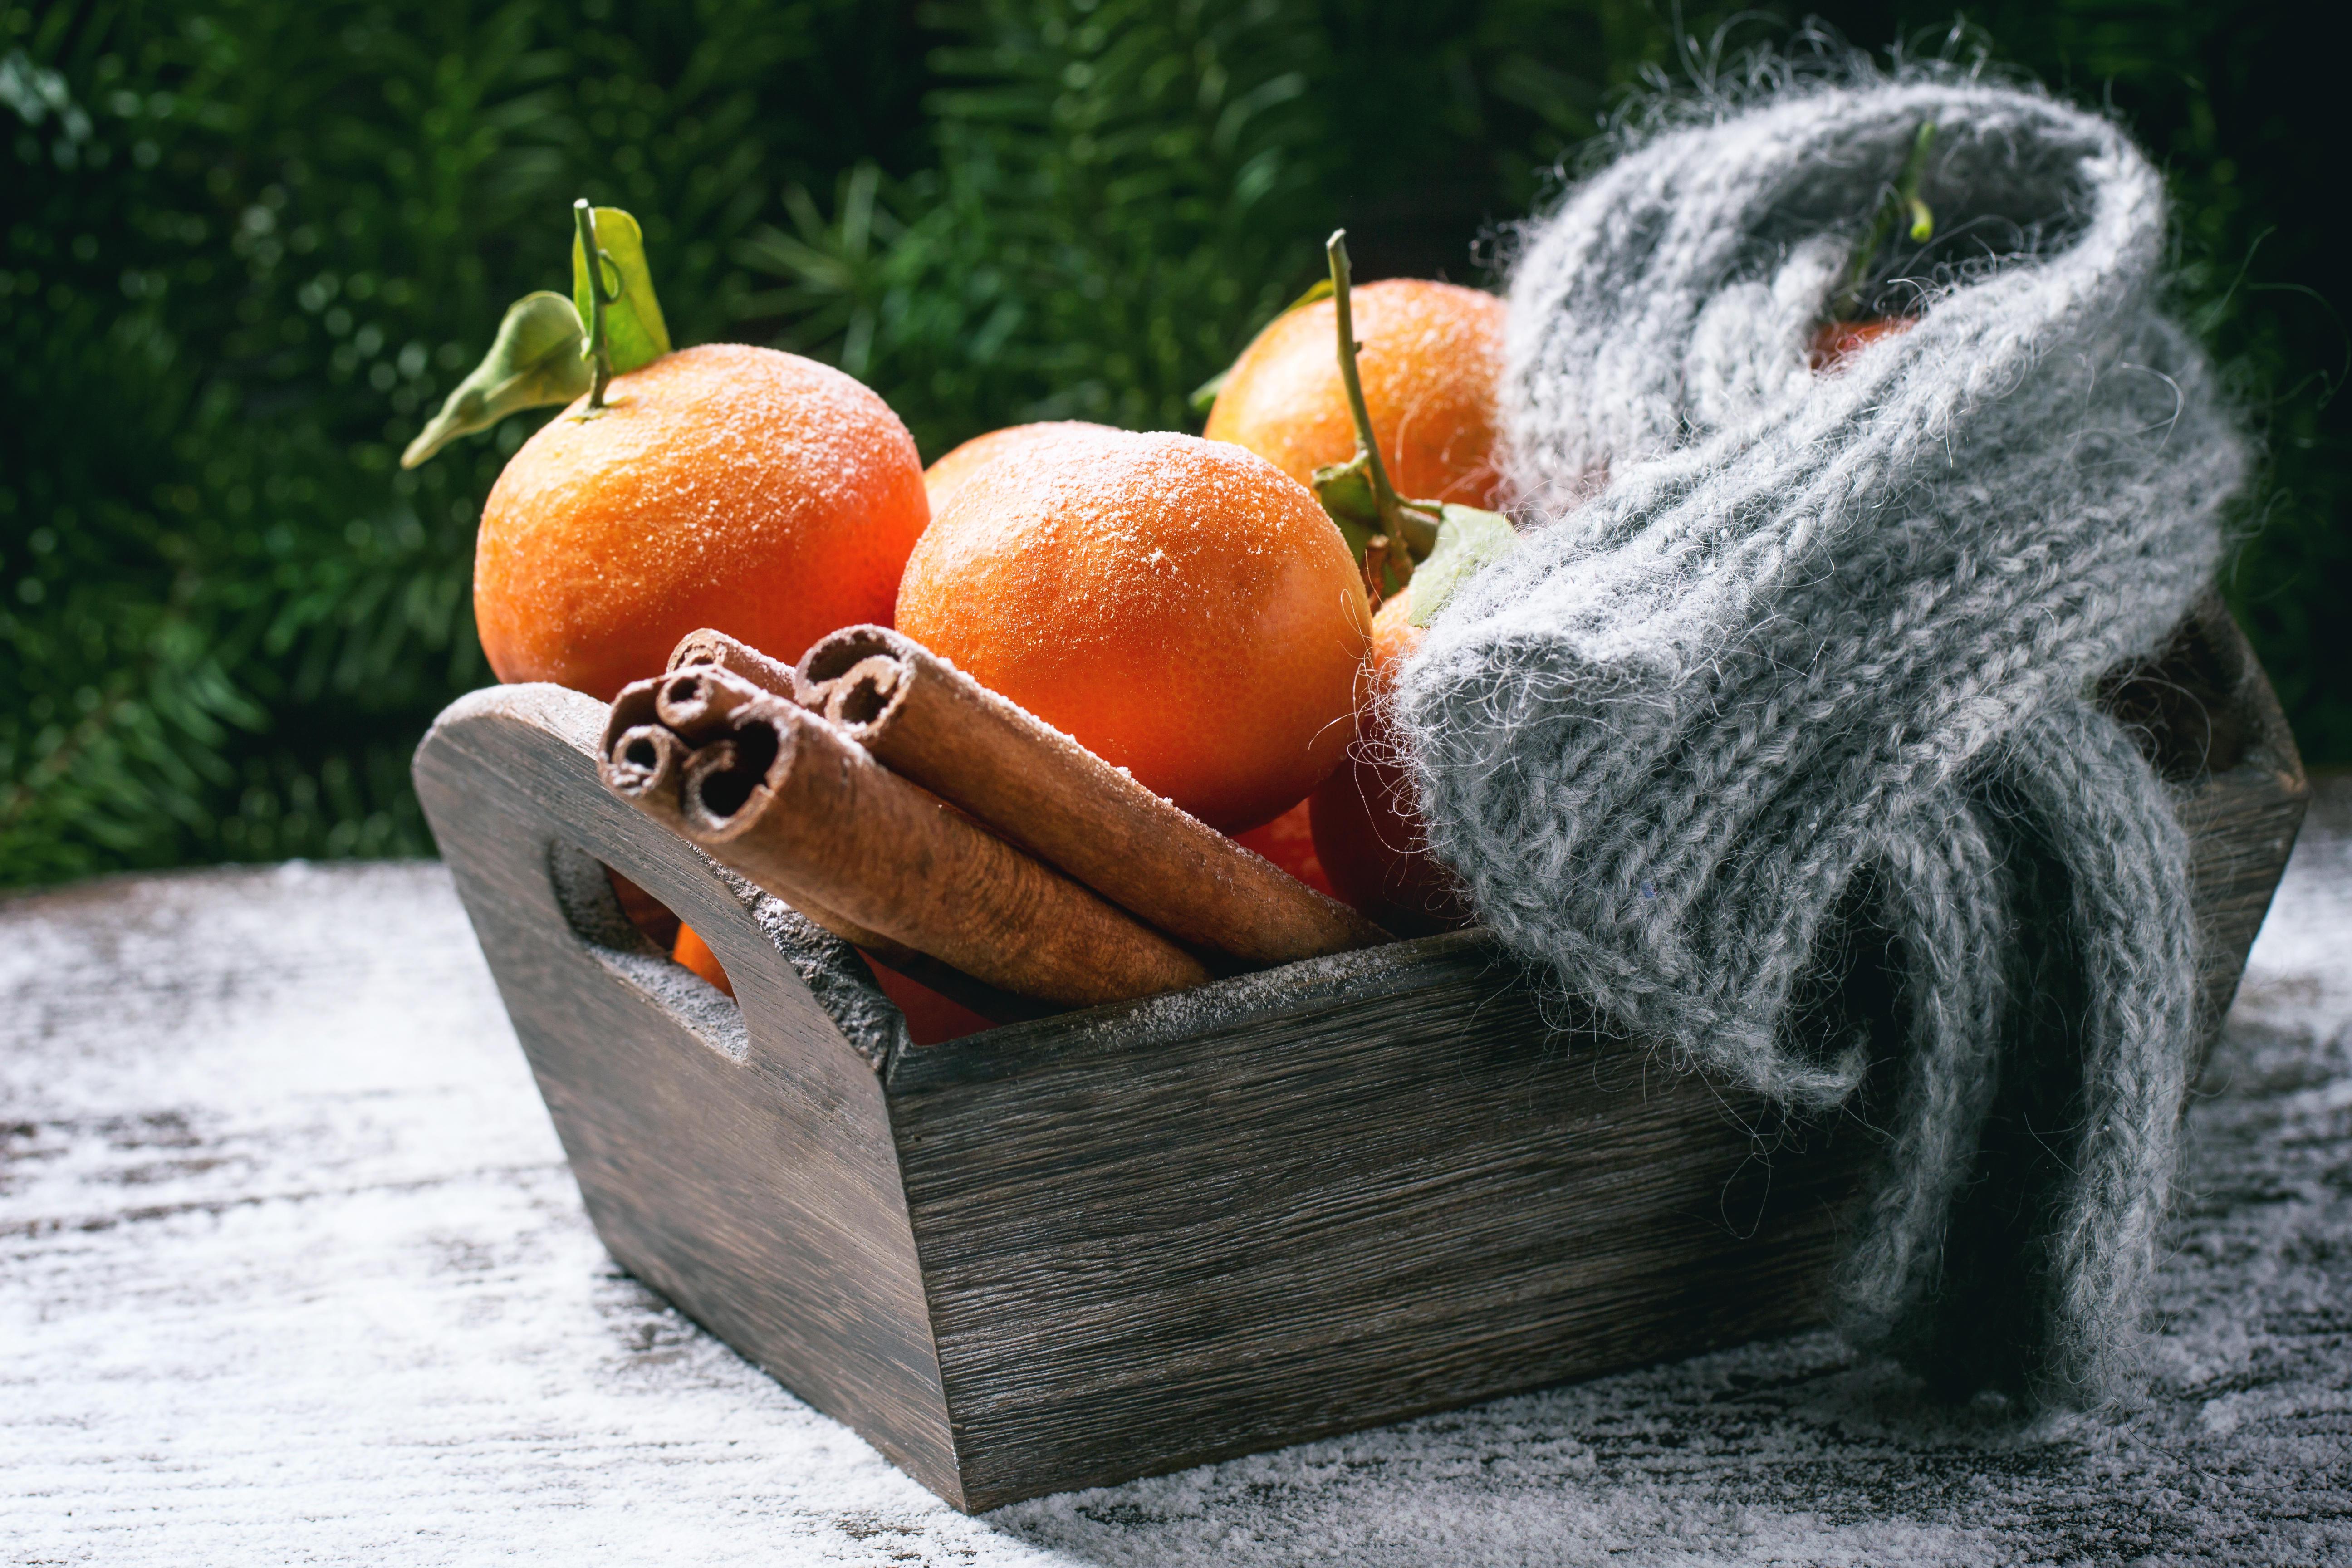 мандарины, фрукты, продукты